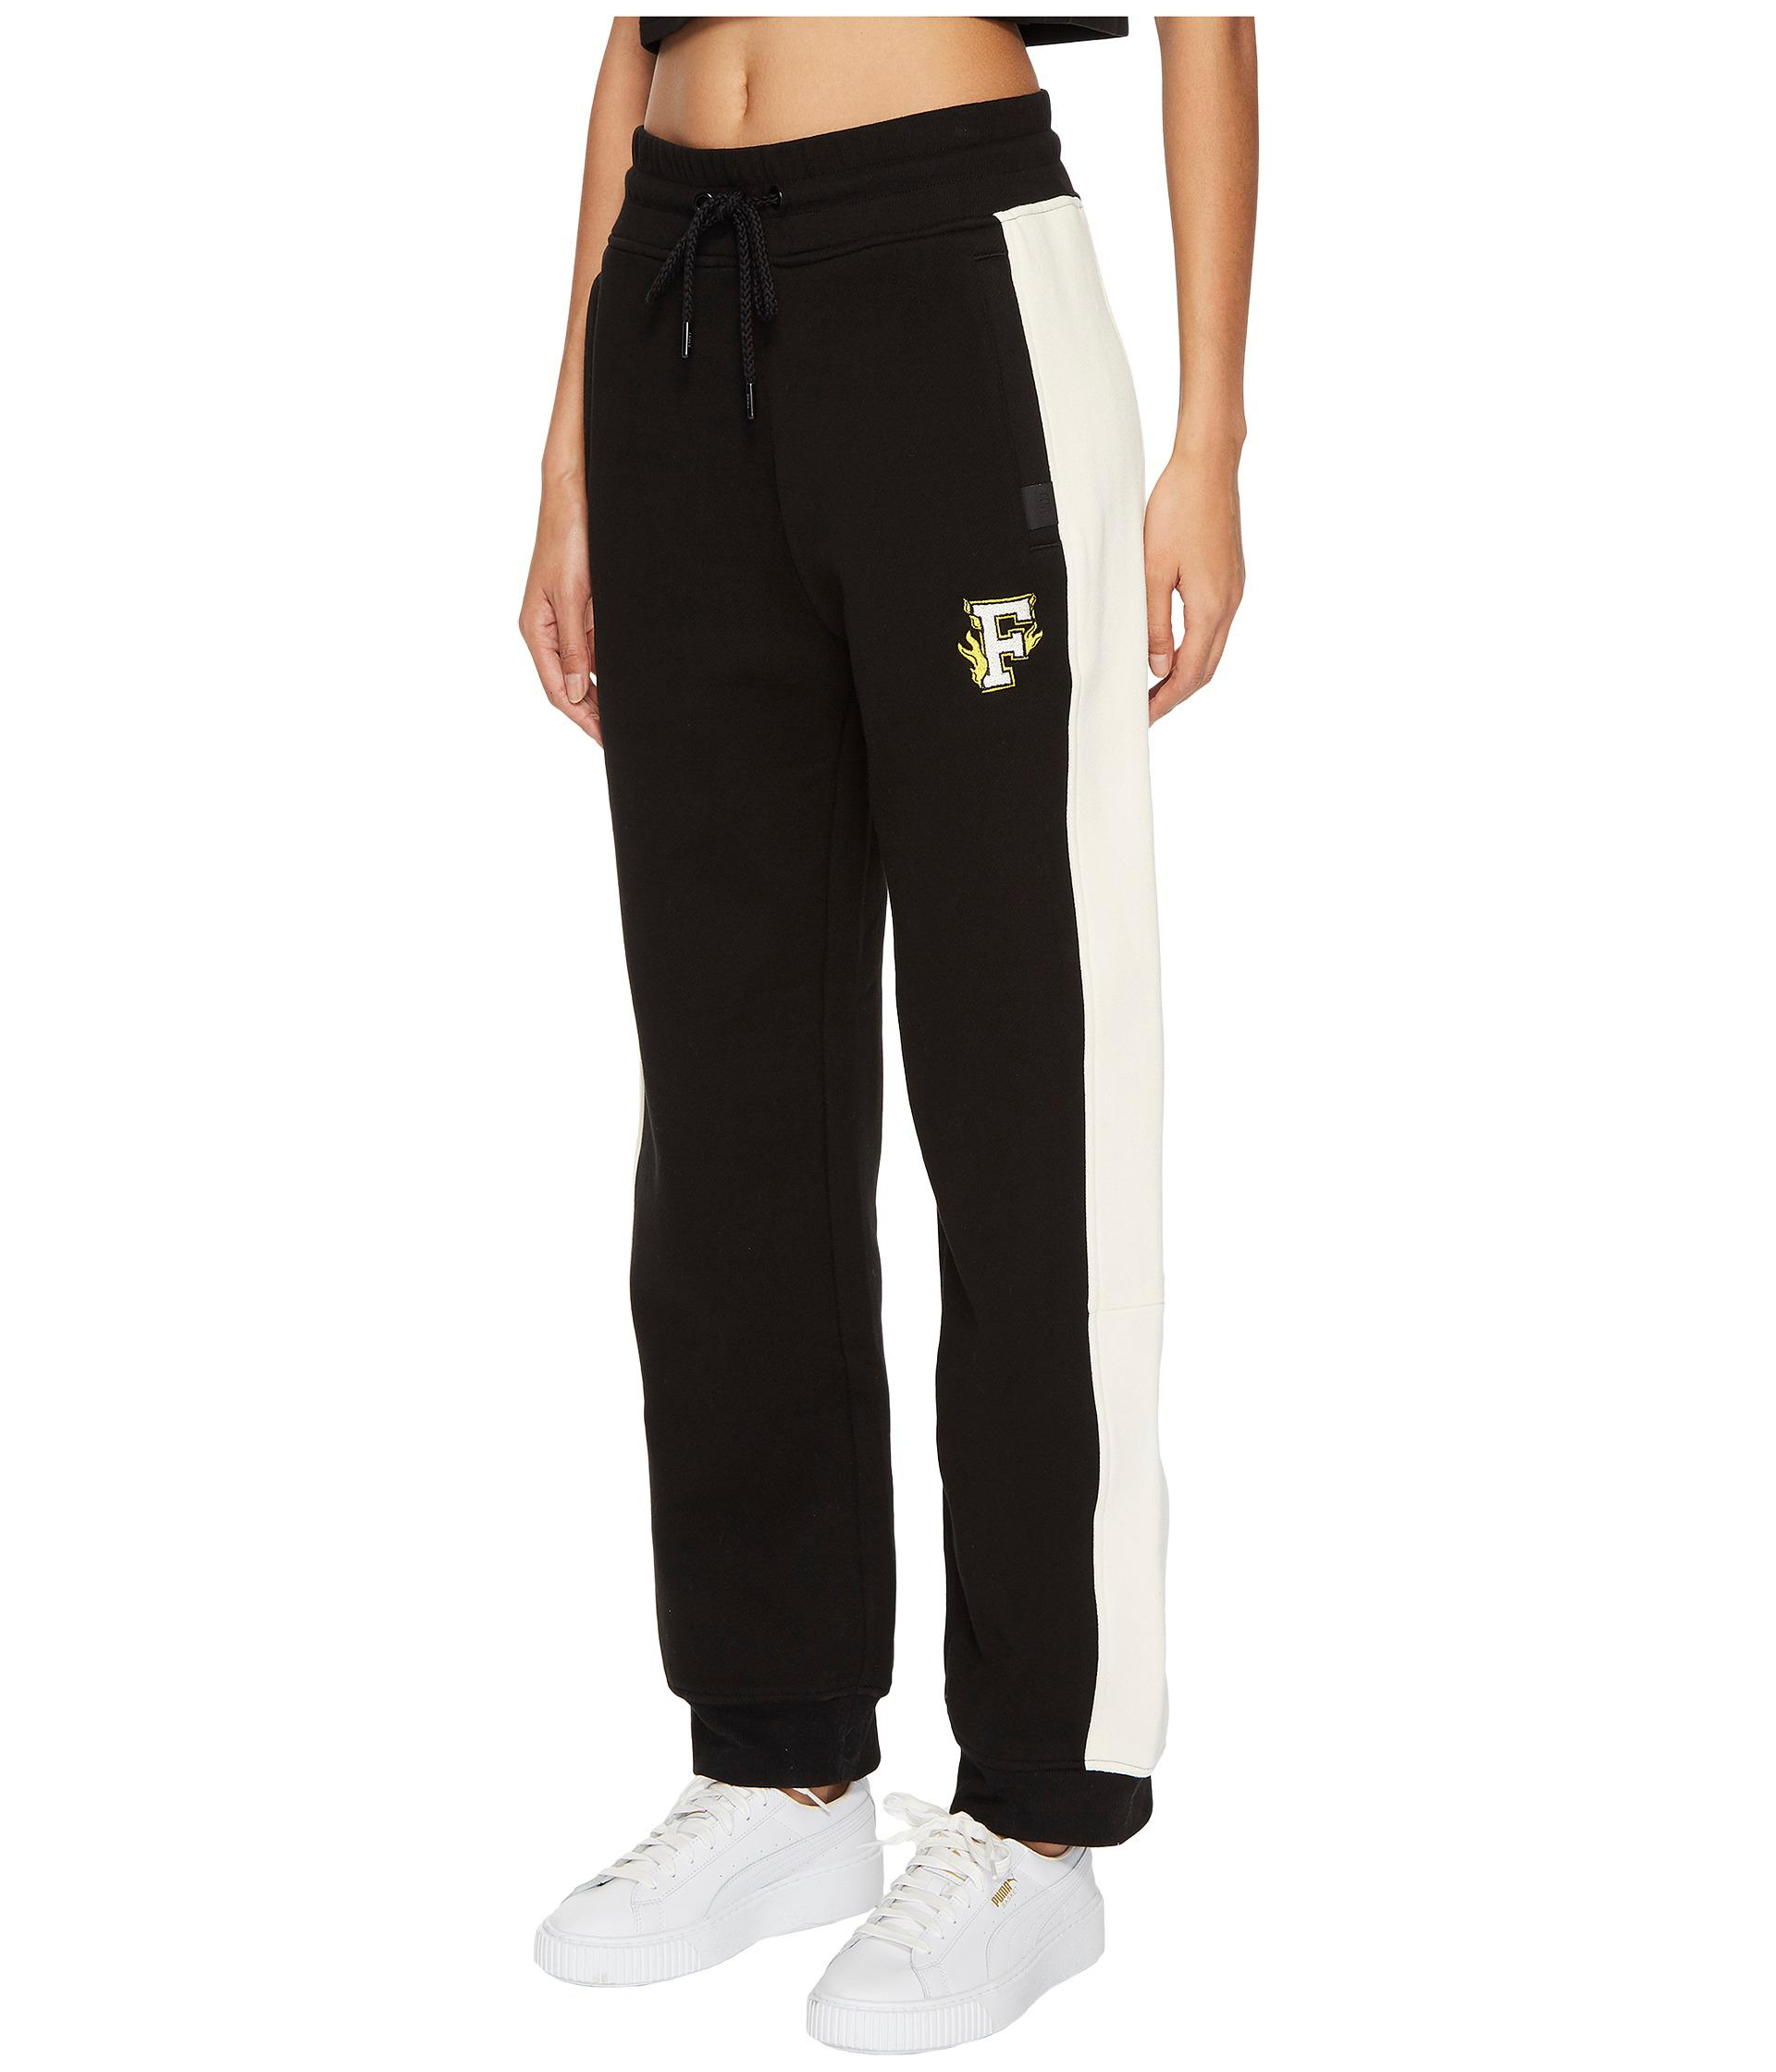 b27398f1a216 Lyst - PUMA X Fenty By Rihanna Fitted Panel Sweatpants in Black